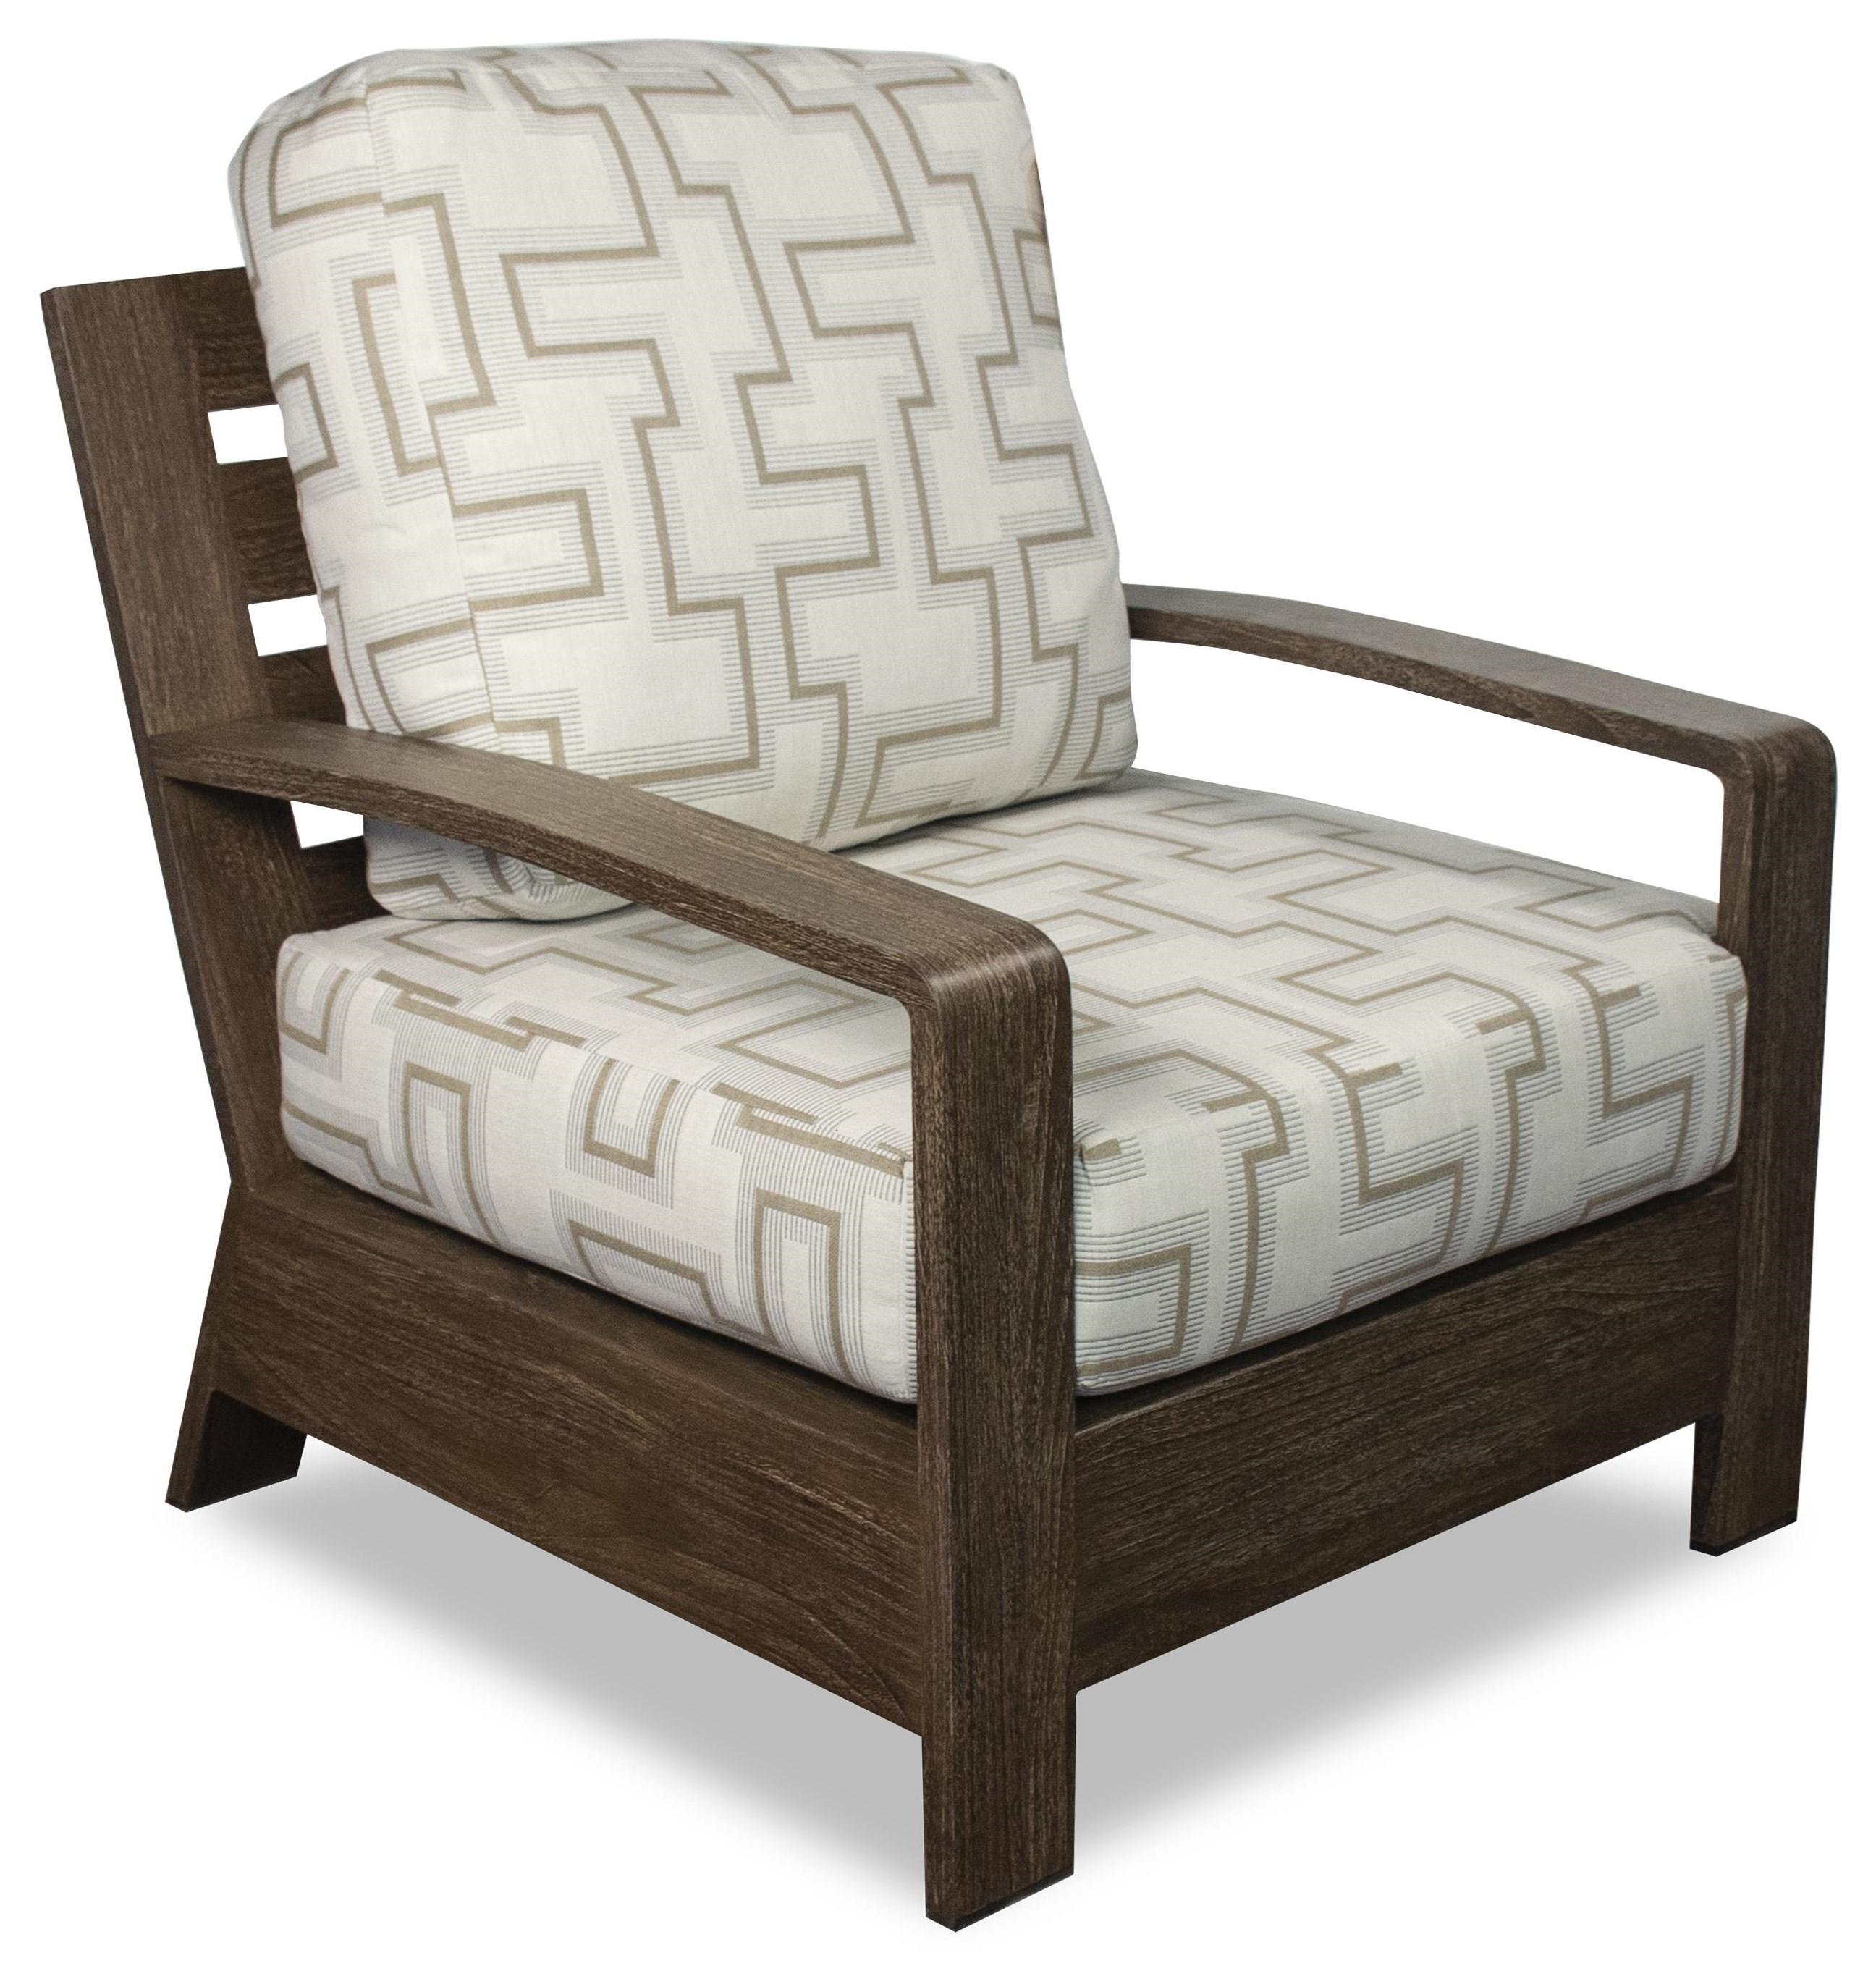 Patio Renaissance Seattle Lounge Chair by Patio Renaissance at Johnny Janosik